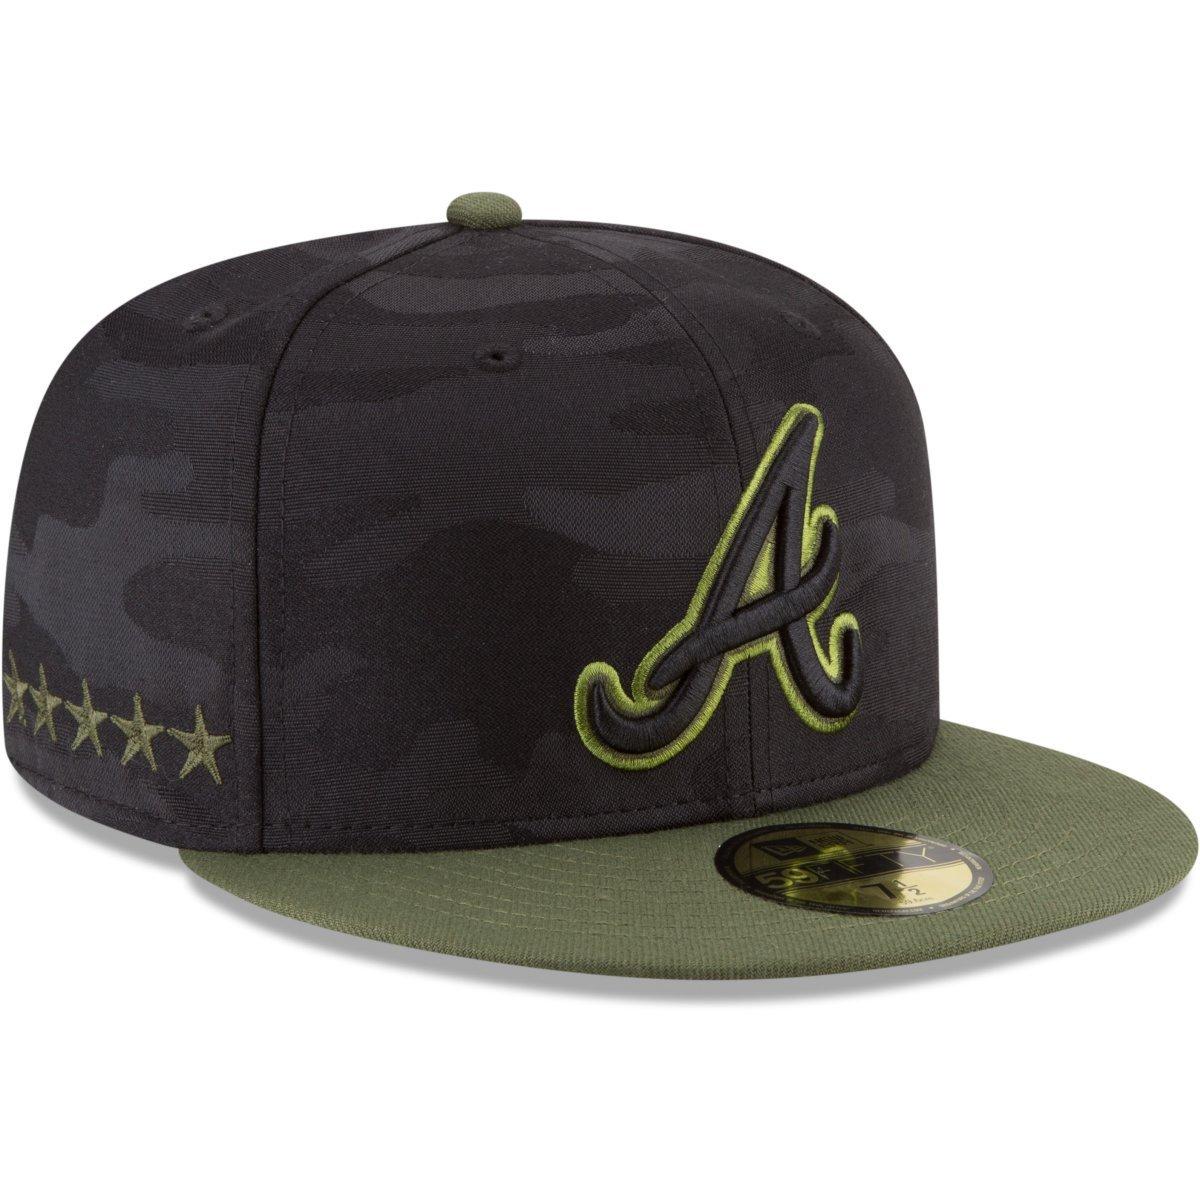 ac0b8662441936 Amazon.com: New Era 59Fifty Cap - MEMORIAL DAY Atlanta Braves: Clothing